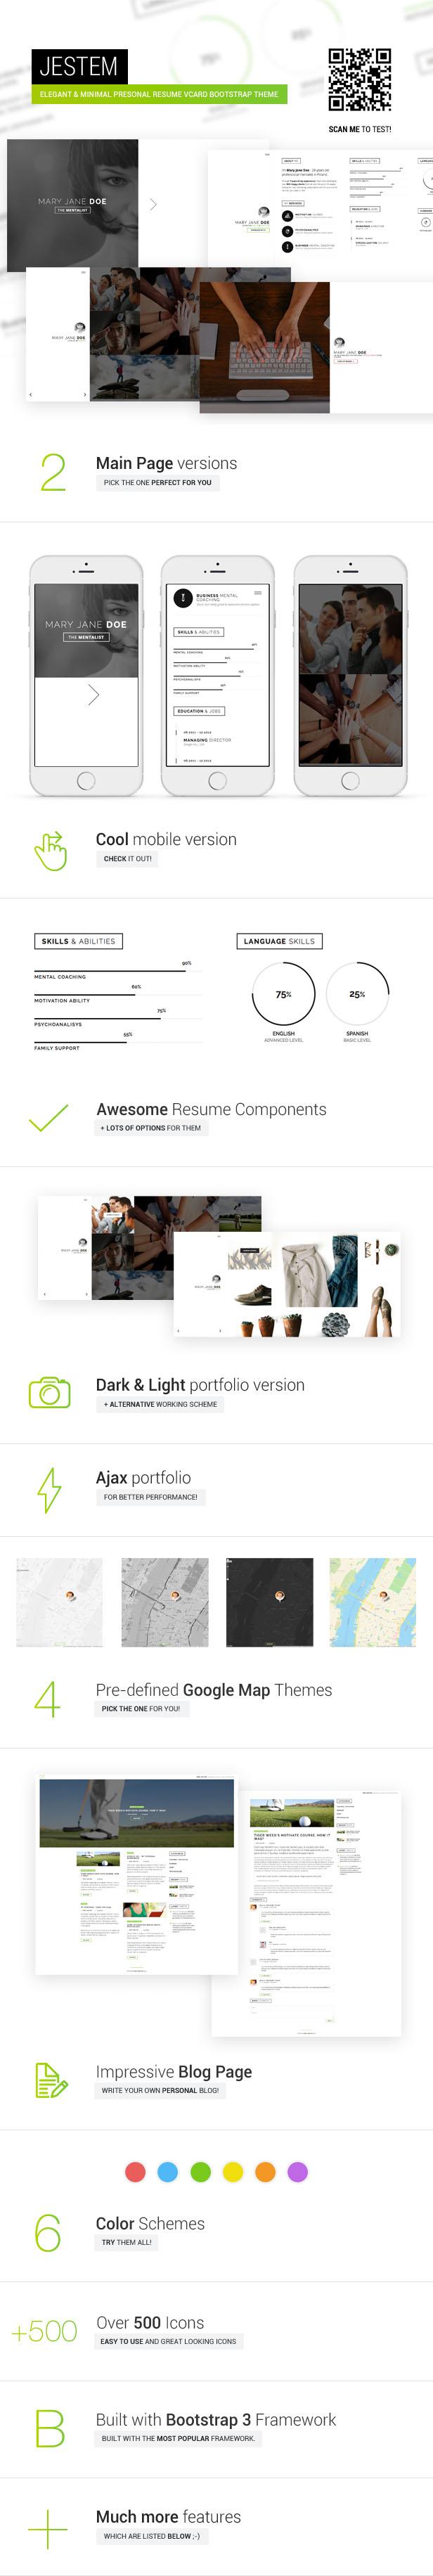 Jestem - Elegant & Minimal Resume vCard Theme